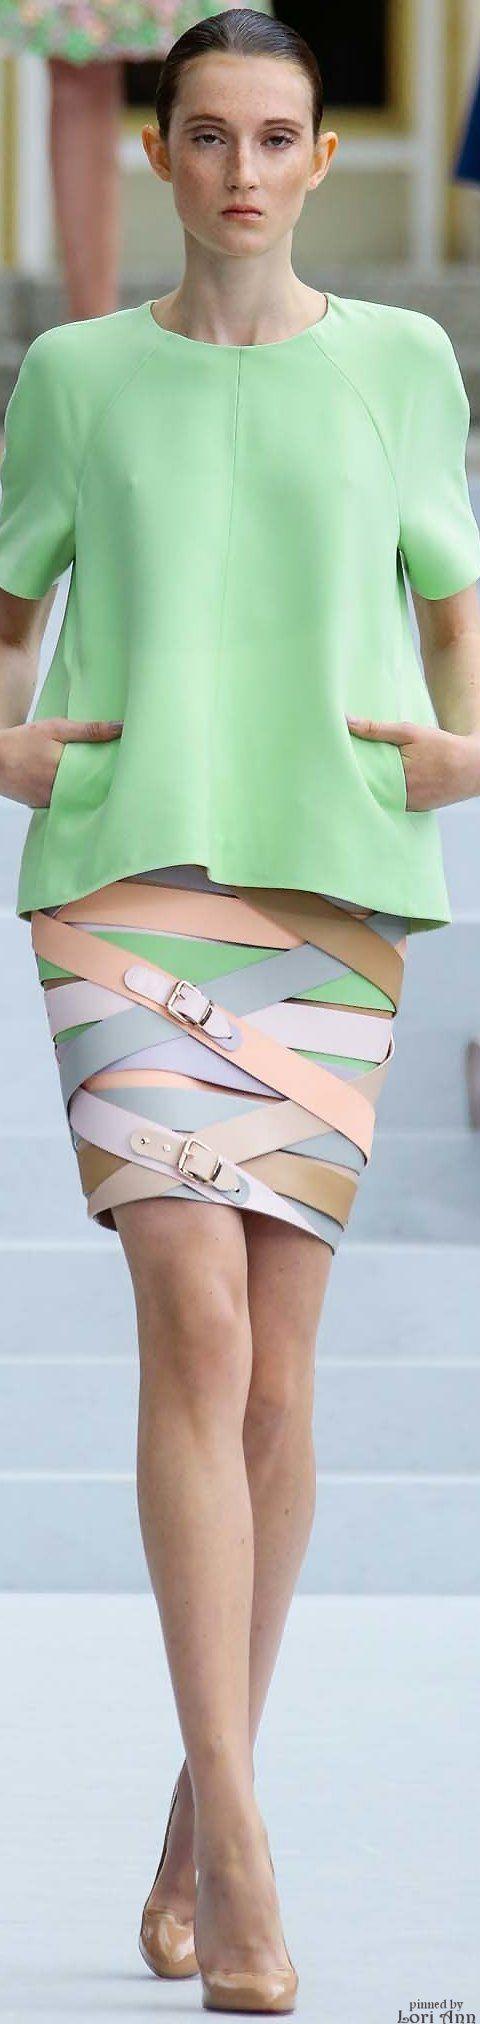 Marina Hoermanseder Spring 2016 RTW - Women's Belts - http://amzn.to/2hOqA0h